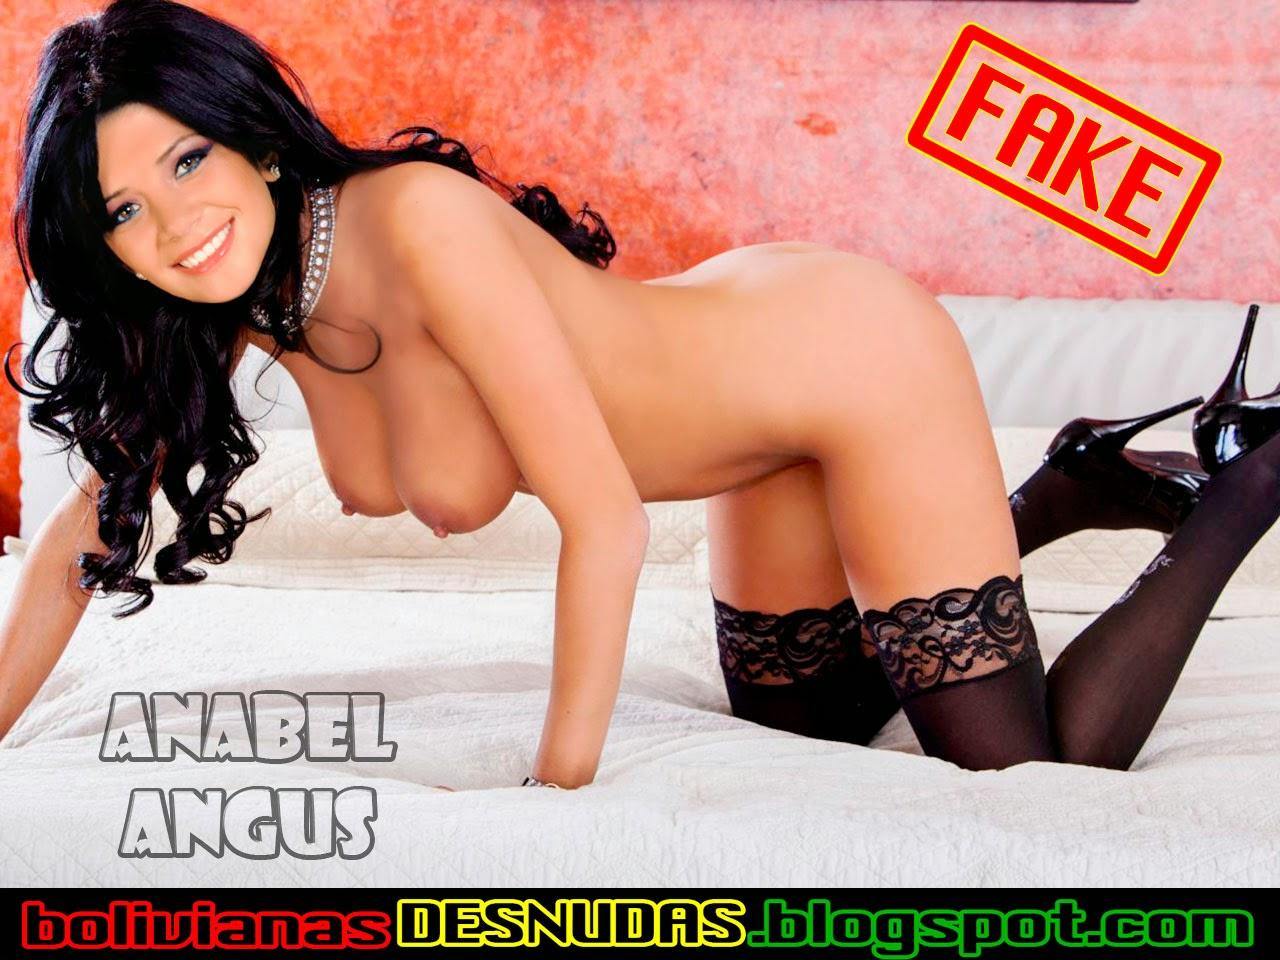 fotos de Anabel angus desnuda xxx